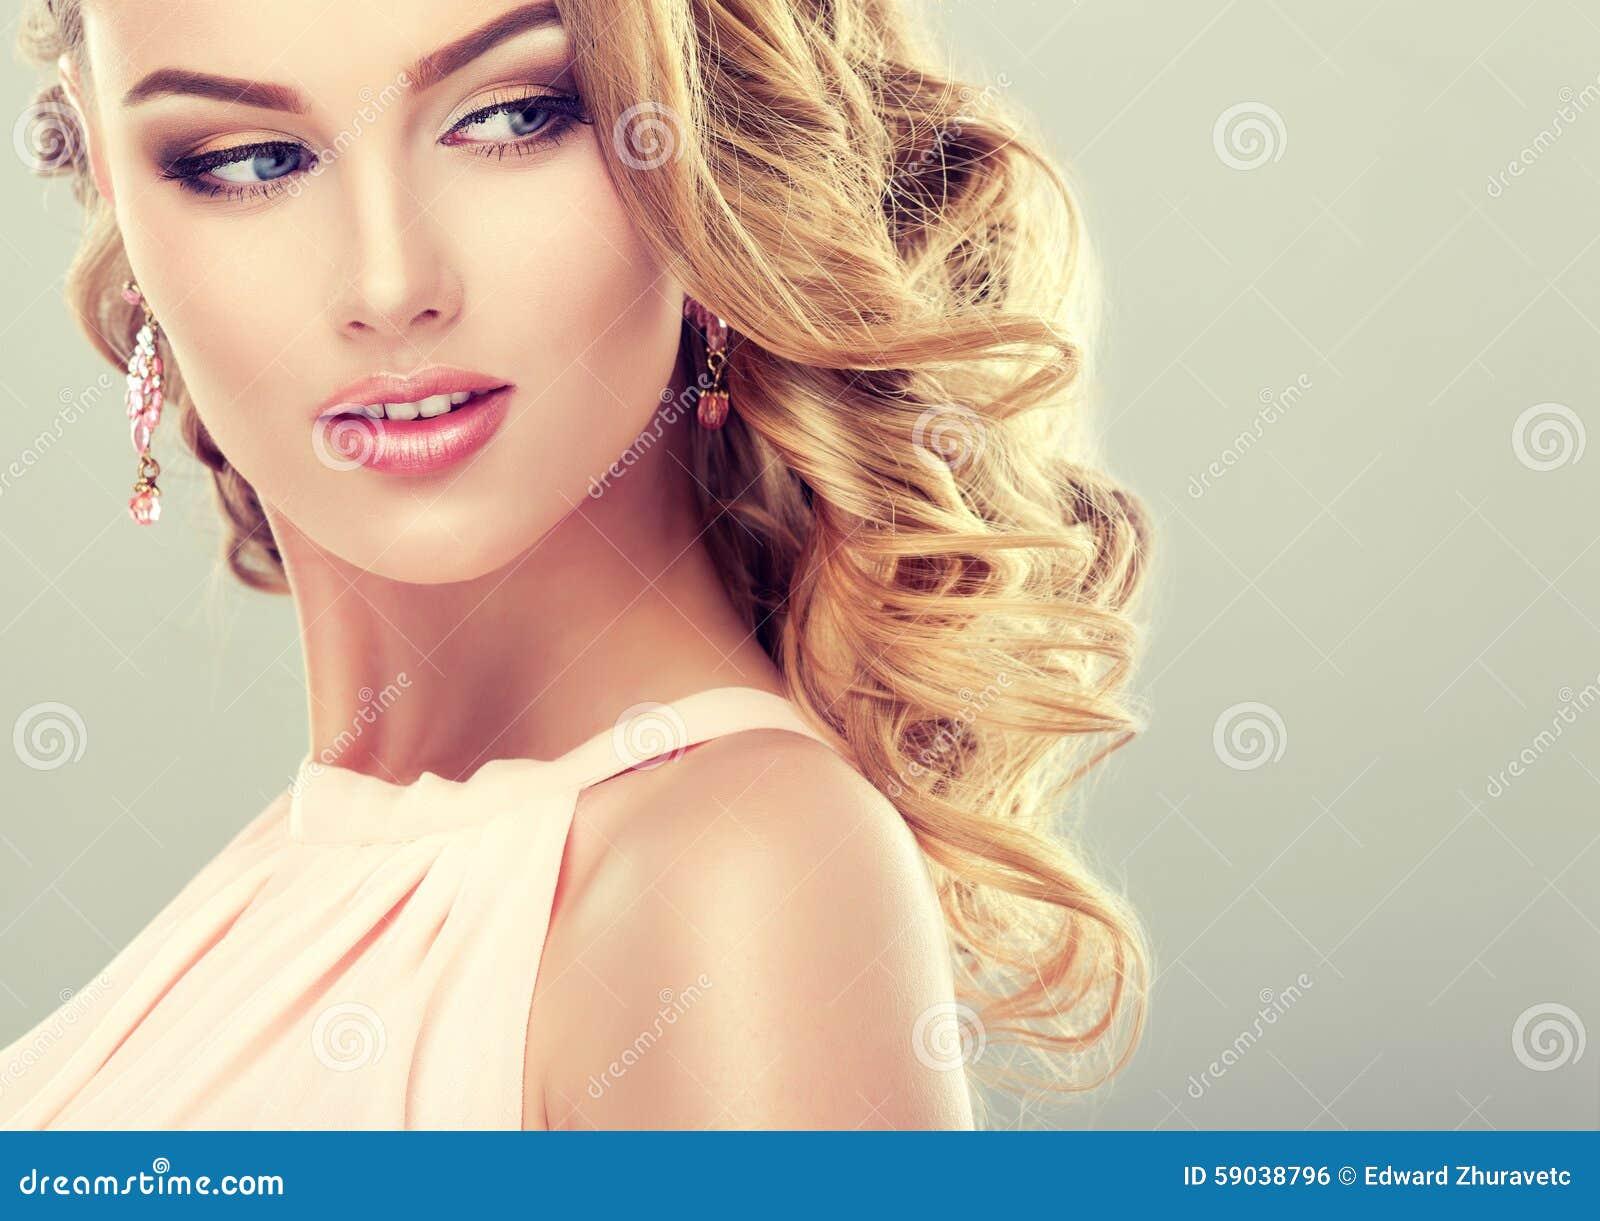 Beautiful Model With Elegant Hairstyle . Stock Photo - Image: 59038796